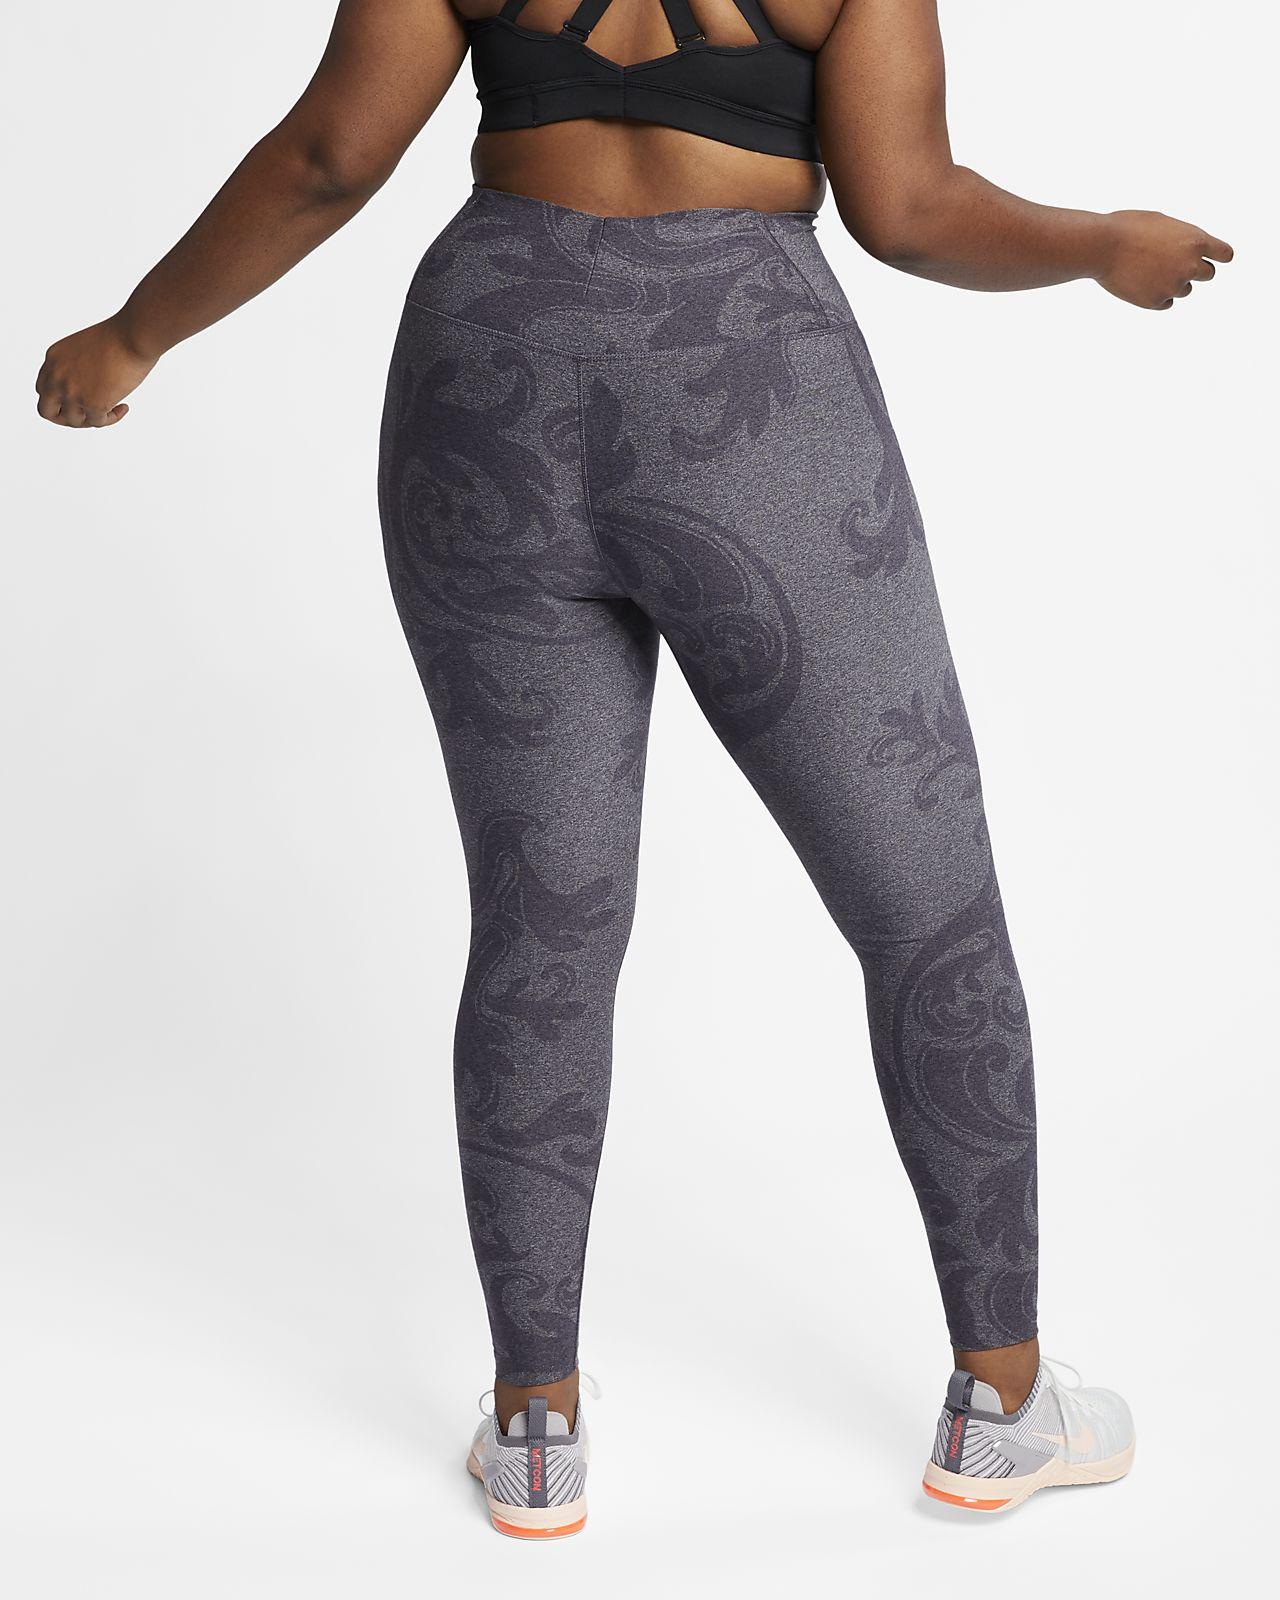 5fe7e164430 ... Nike Dri-FIT Power Studio Women s Printed Training Tights (Plus Size)